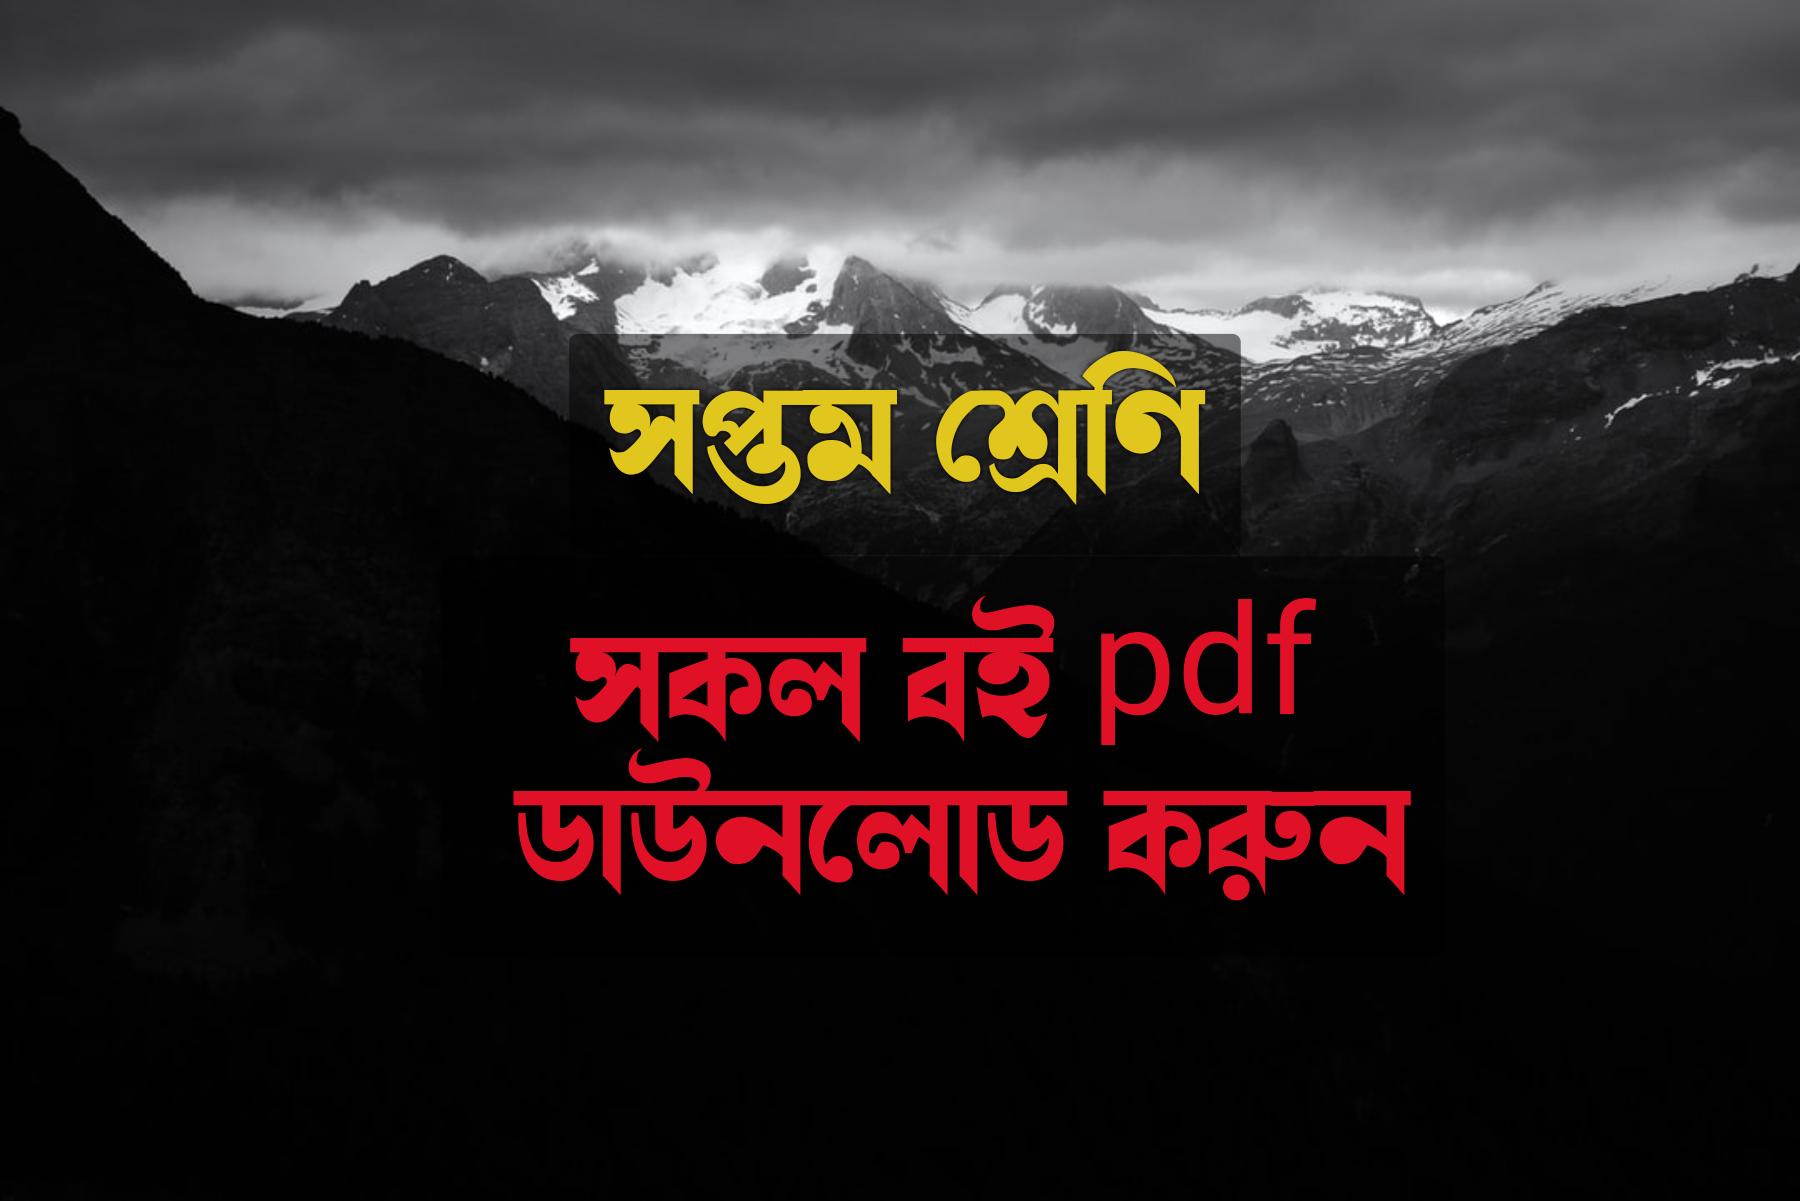 Class Seven All Book PDF Download | সপ্তম শ্রেণীর সকল বই pdf download করুন